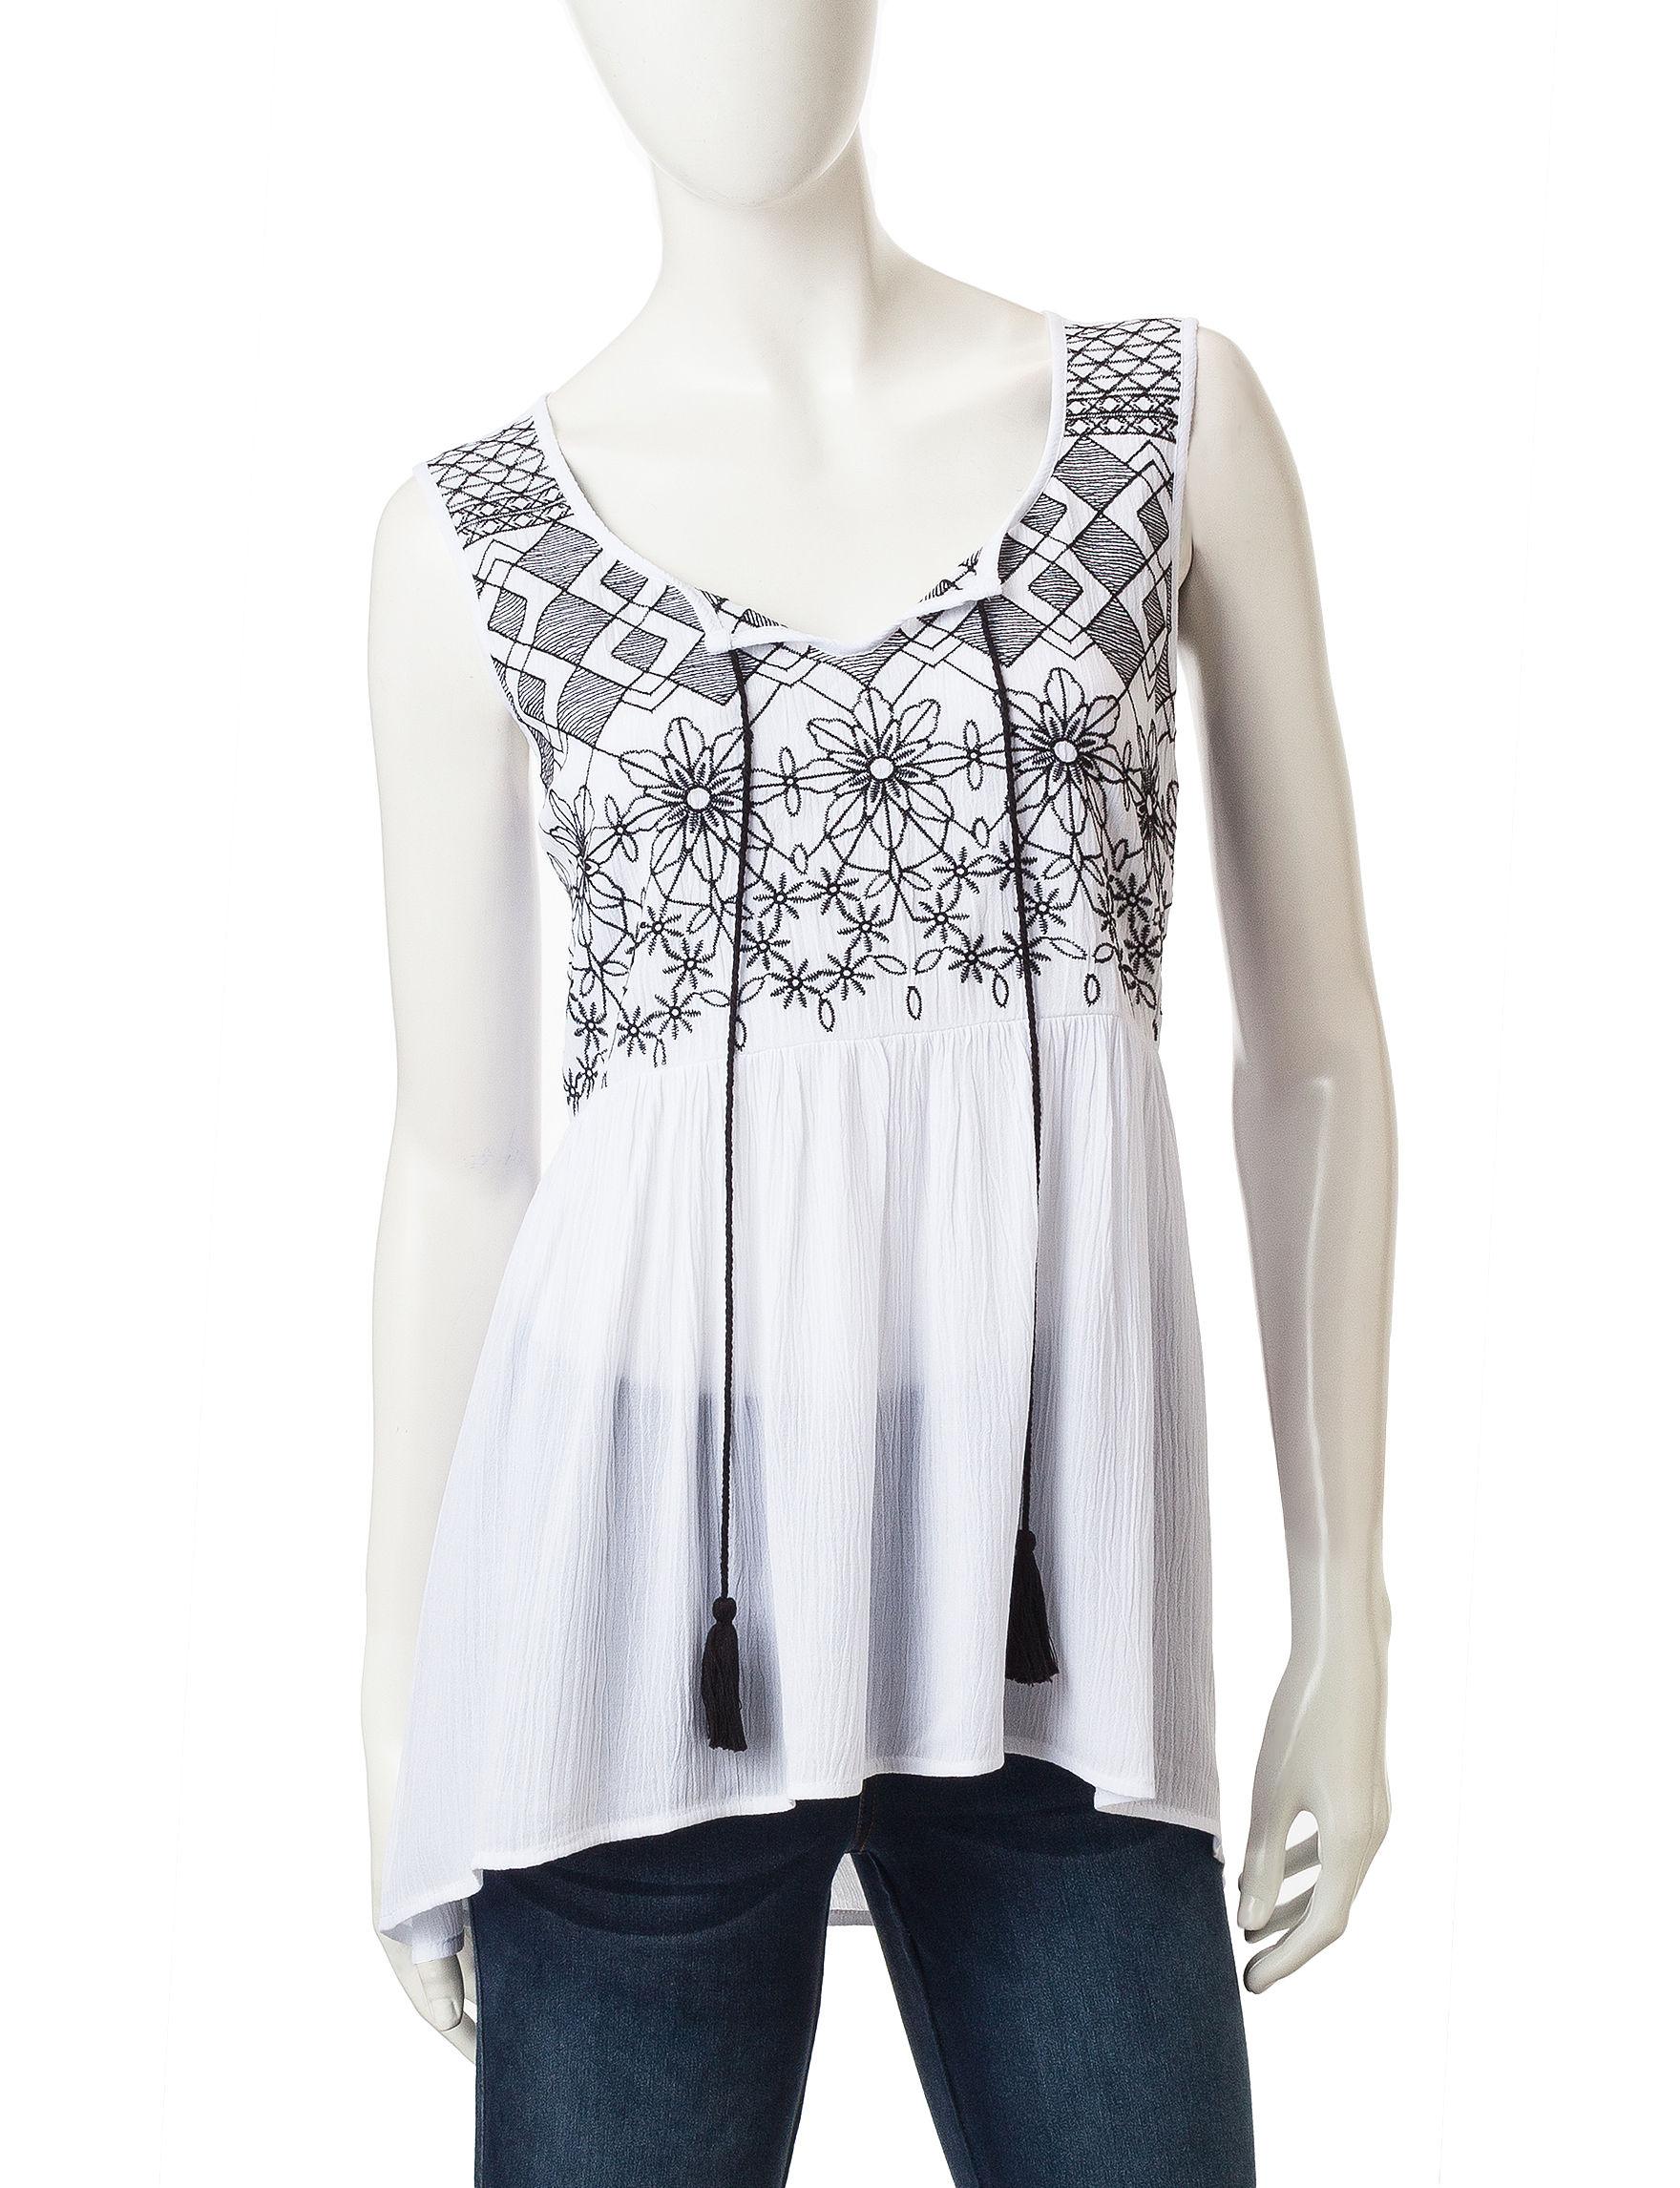 Signature Studio White Shirts & Blouses Tees & Tanks